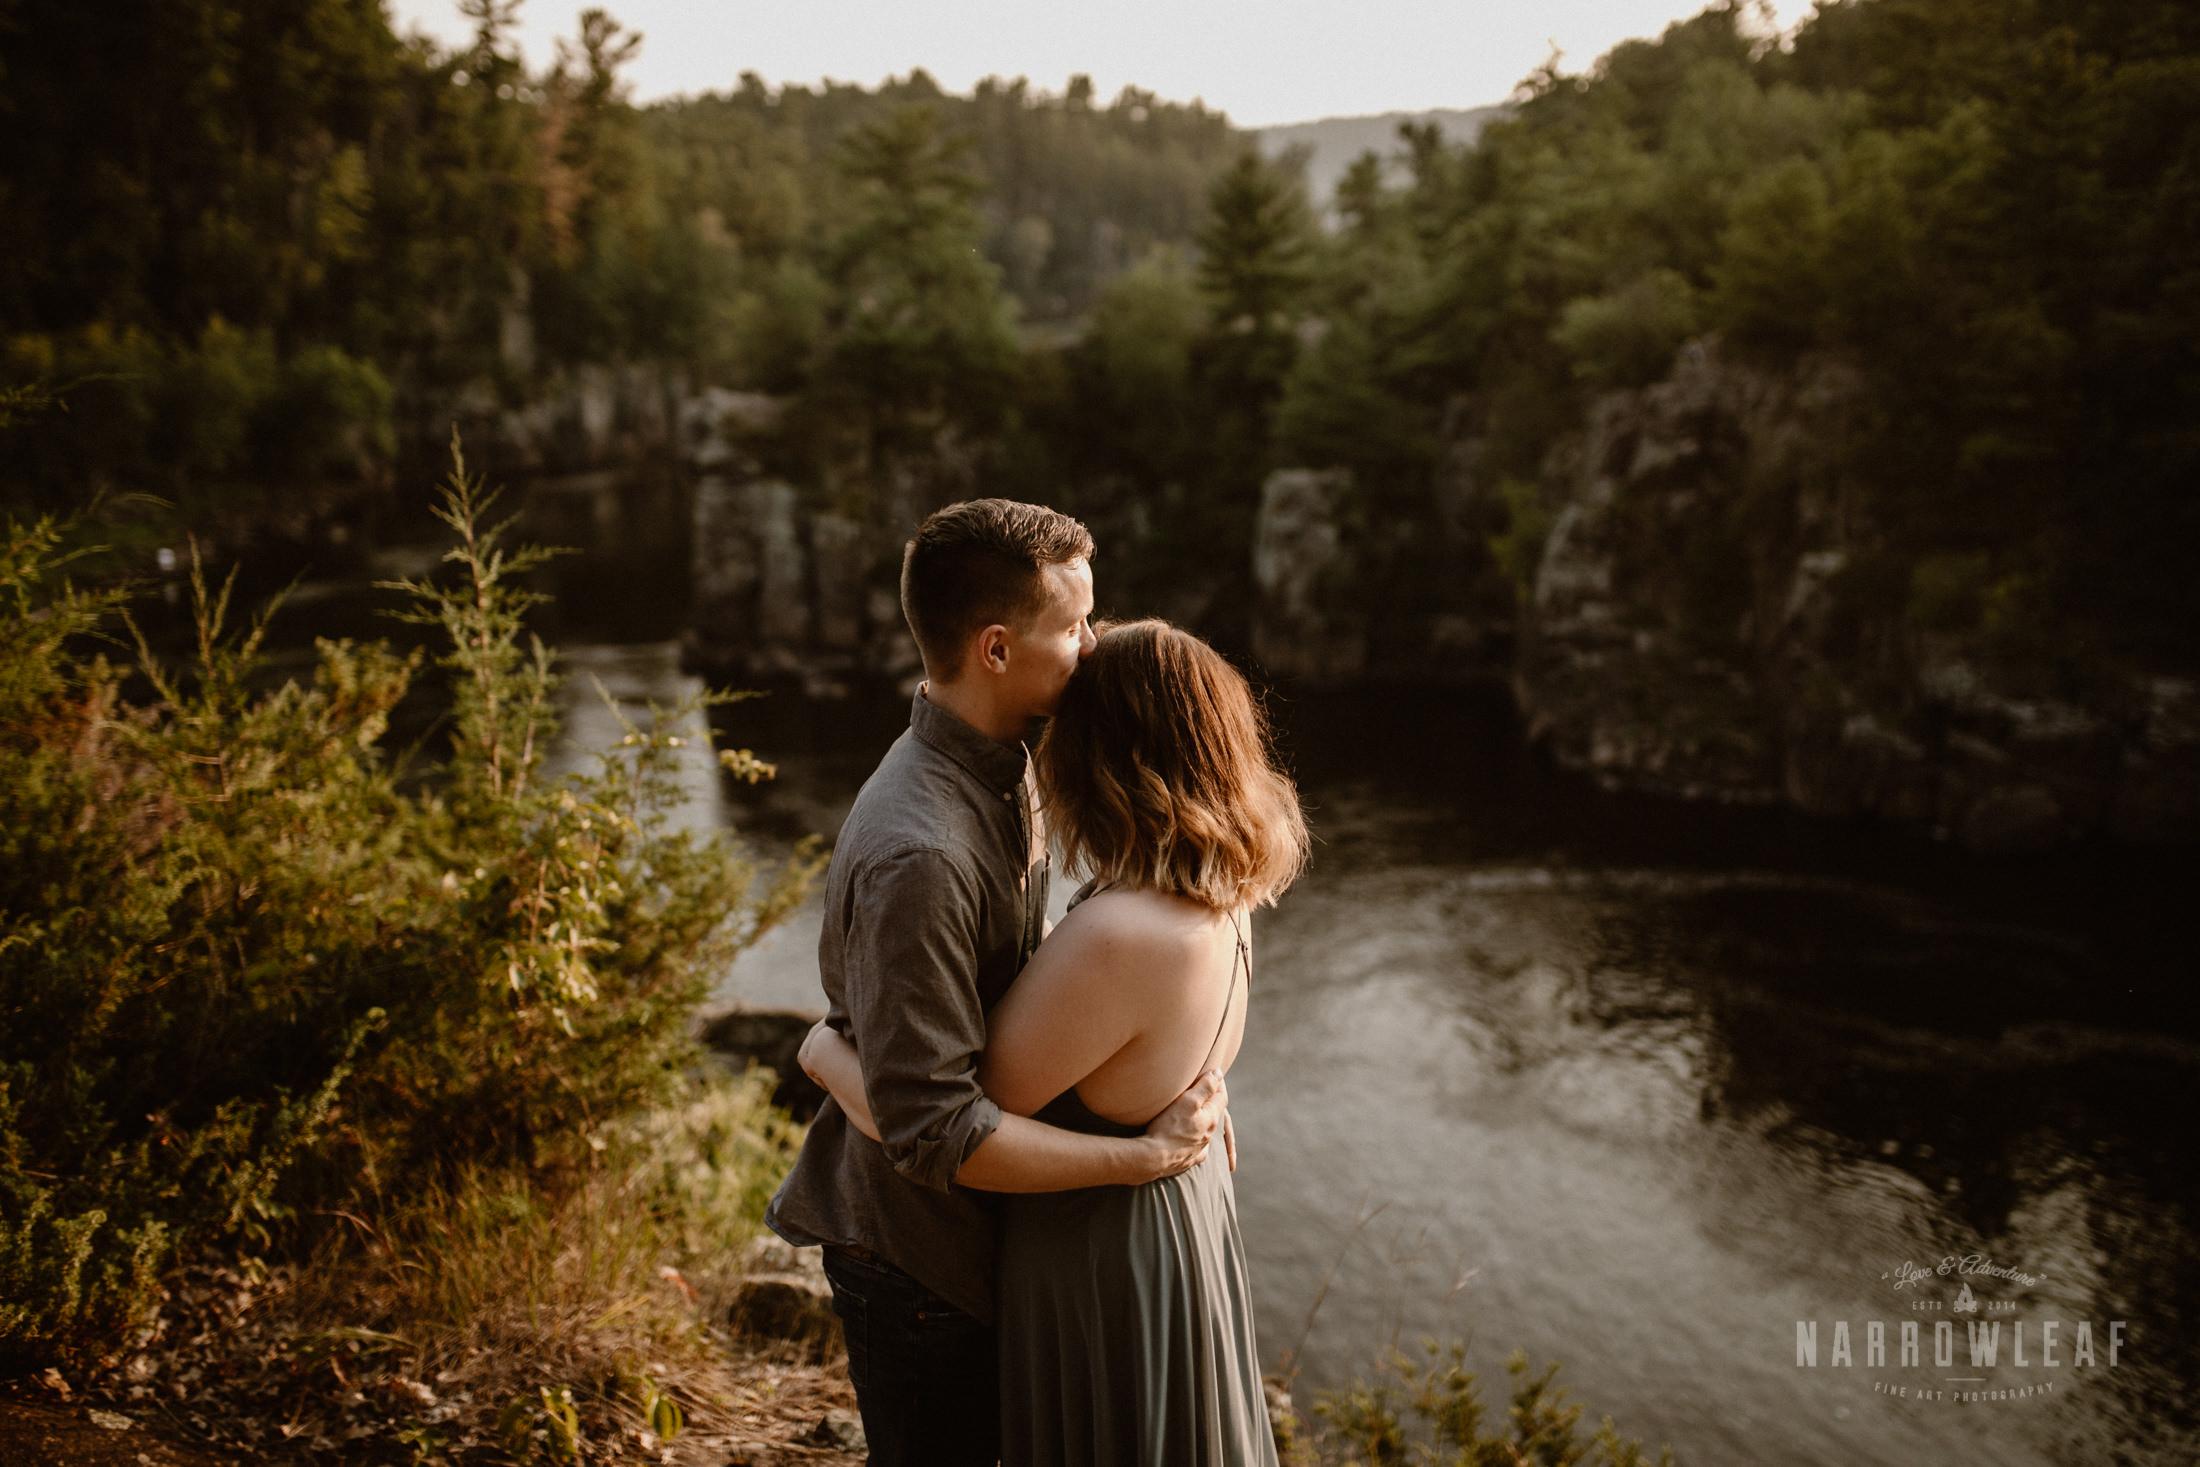 Wisconsin-wedding-adventure-photographer-Narrowleaf_Love_and_Adventure_Photography-1191.jpg